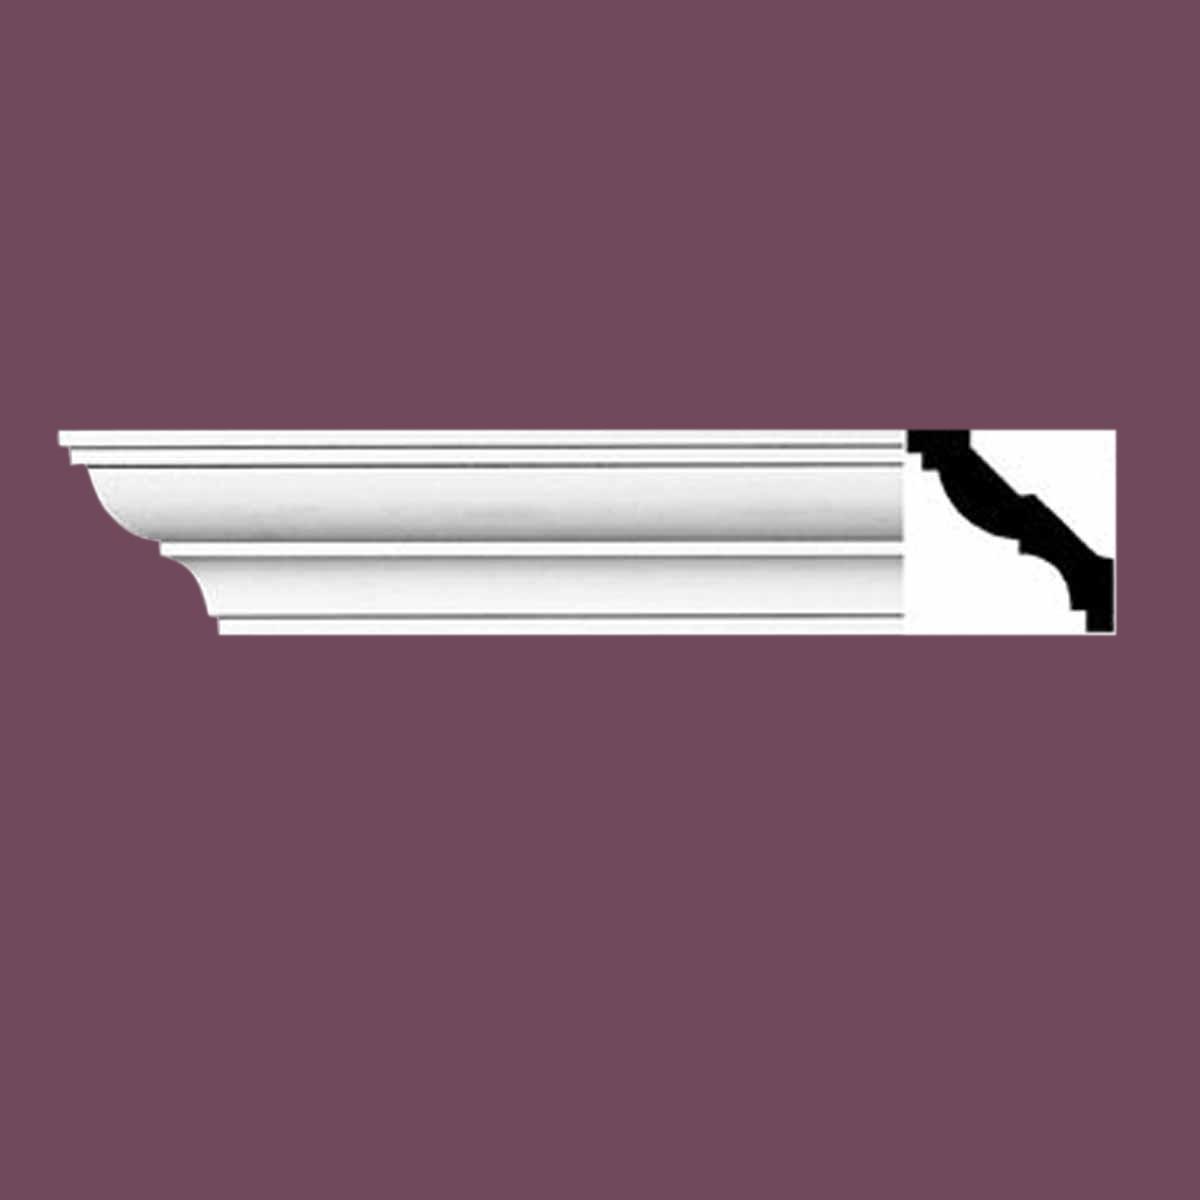 Cornice White Urethane Sample of 11464 24 Long Cornice Cornice Moulding Cornice Molding